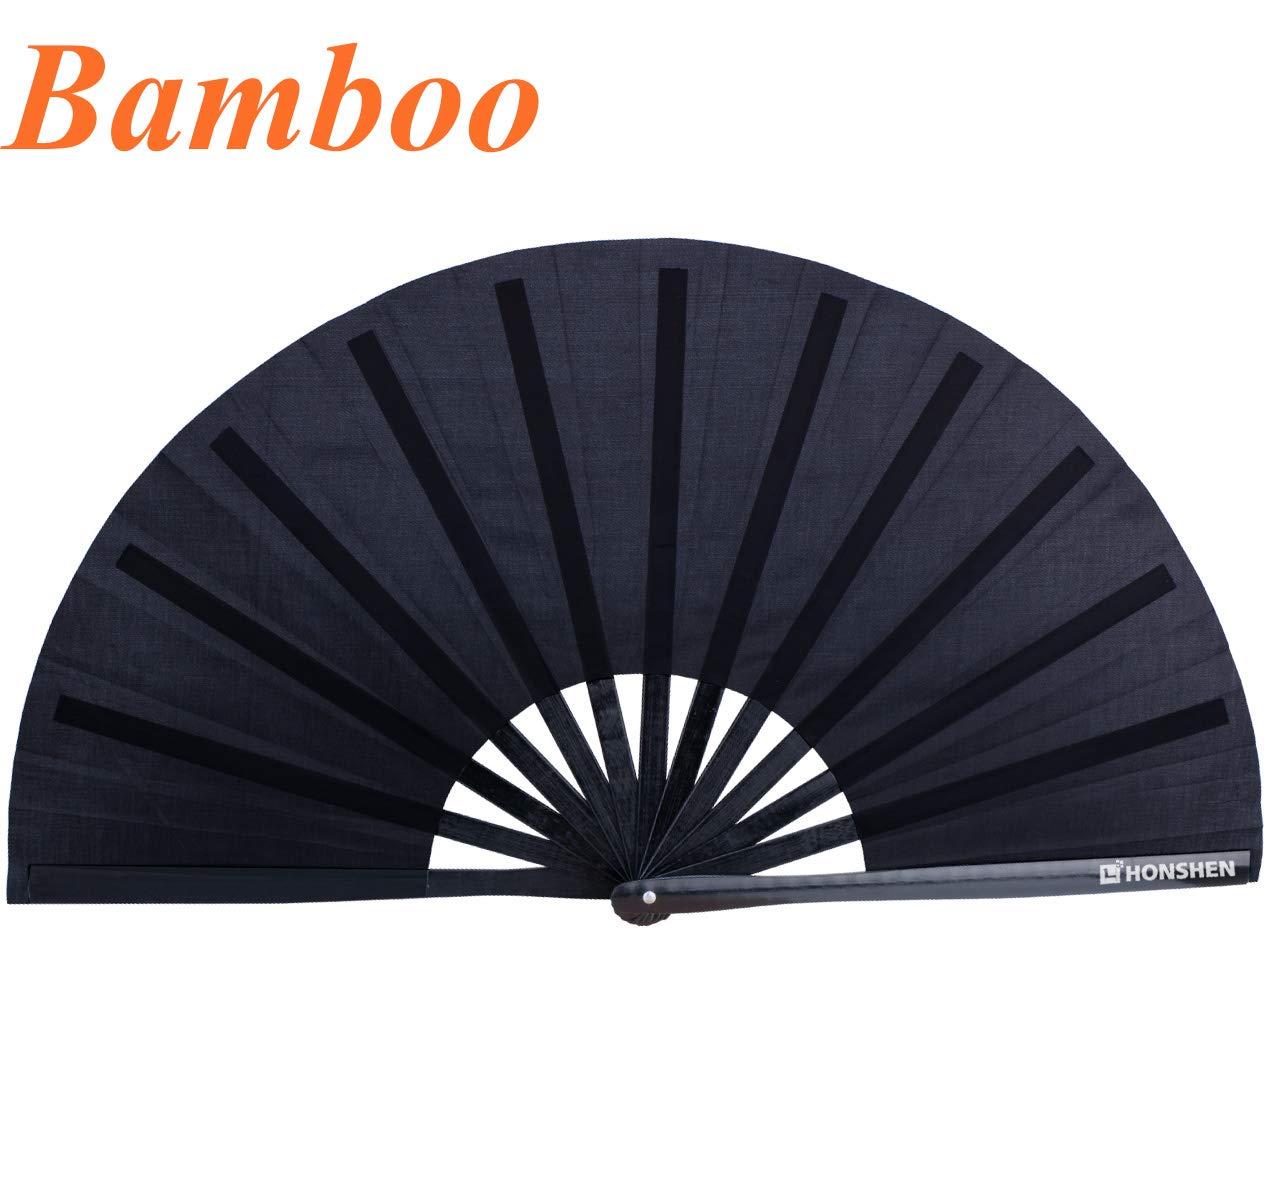 HONSHEN Folding Fan Performance Fan Bamboo-Cloth Fan 13 inch (Black Bamboo)